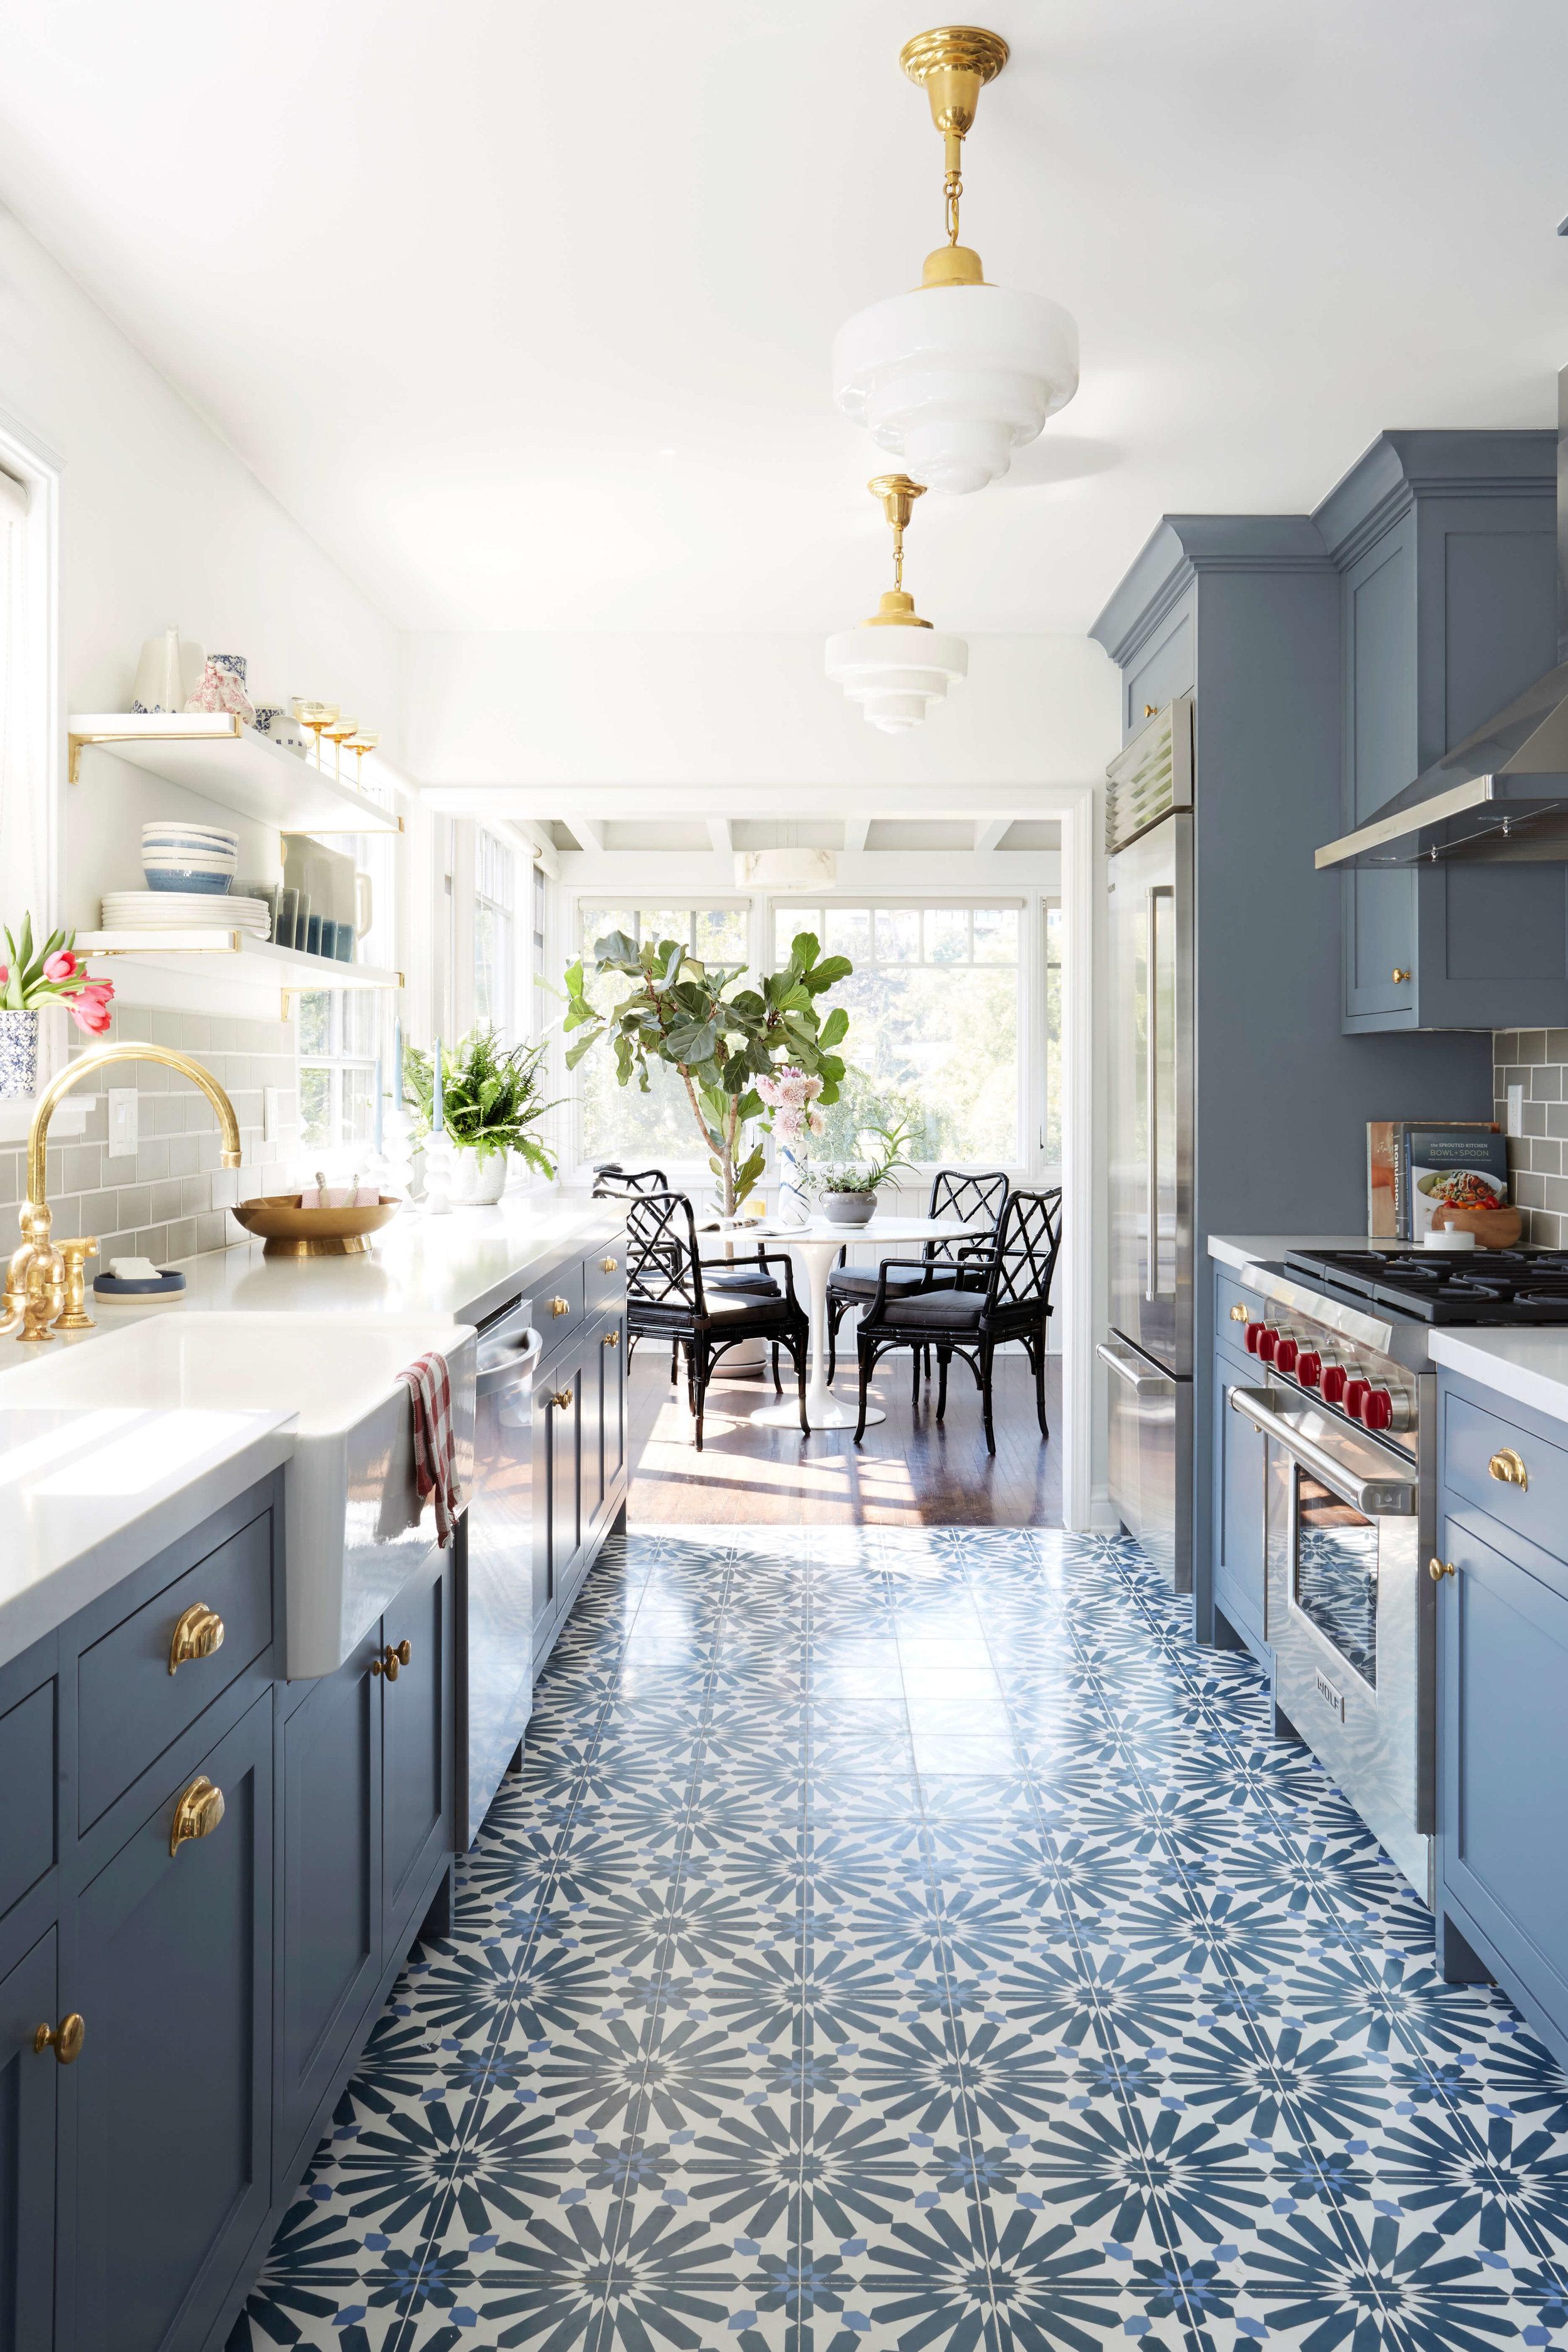 Kitchen design by  Ginny McDonald  for Emily Henderson Design.